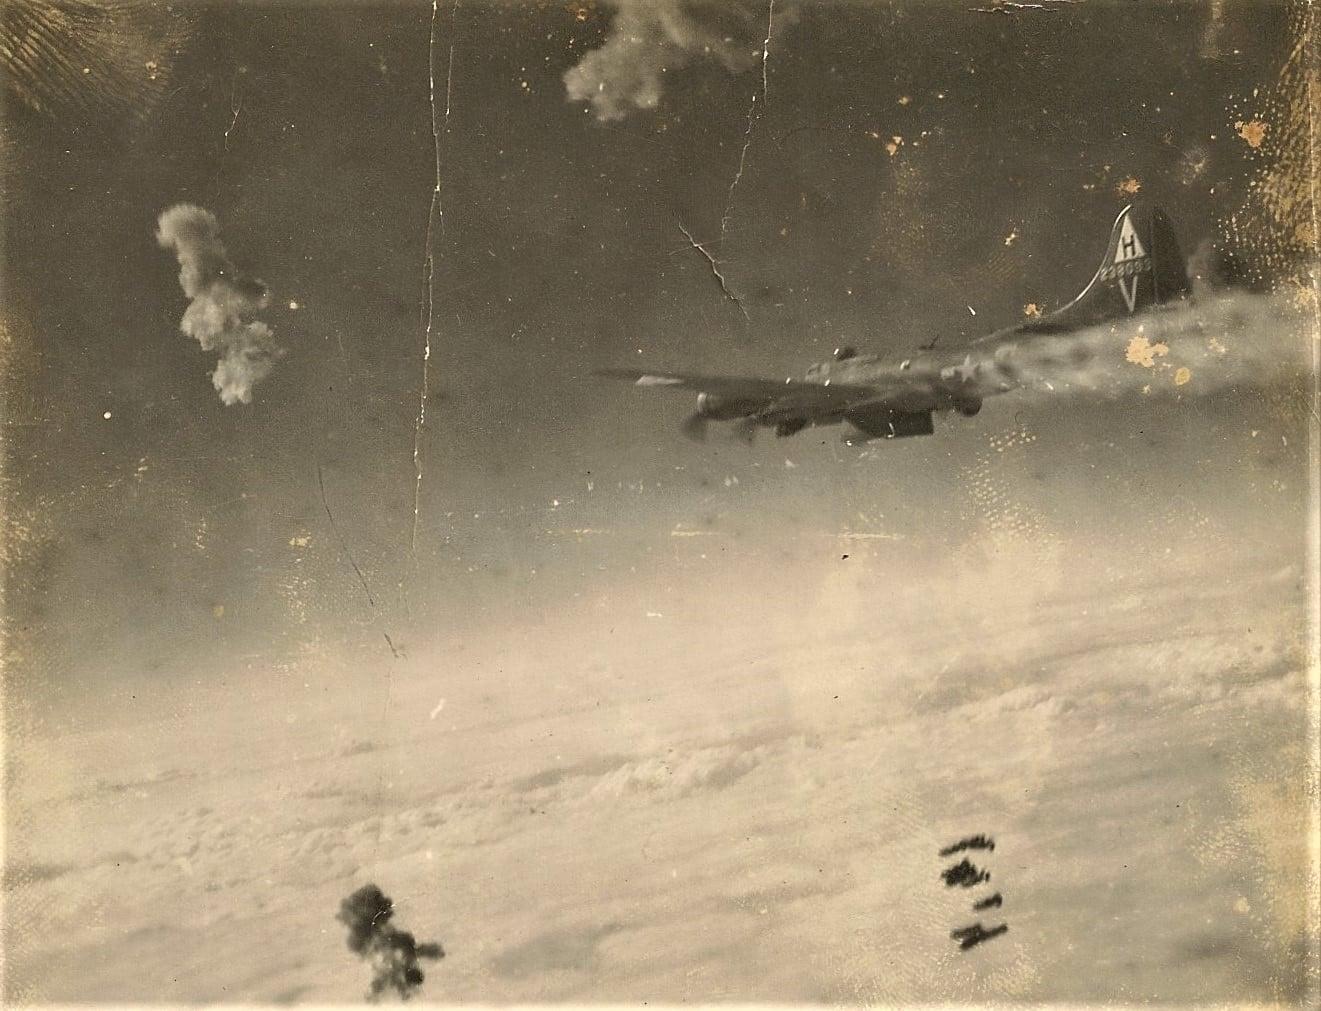 B-17 #42-38093